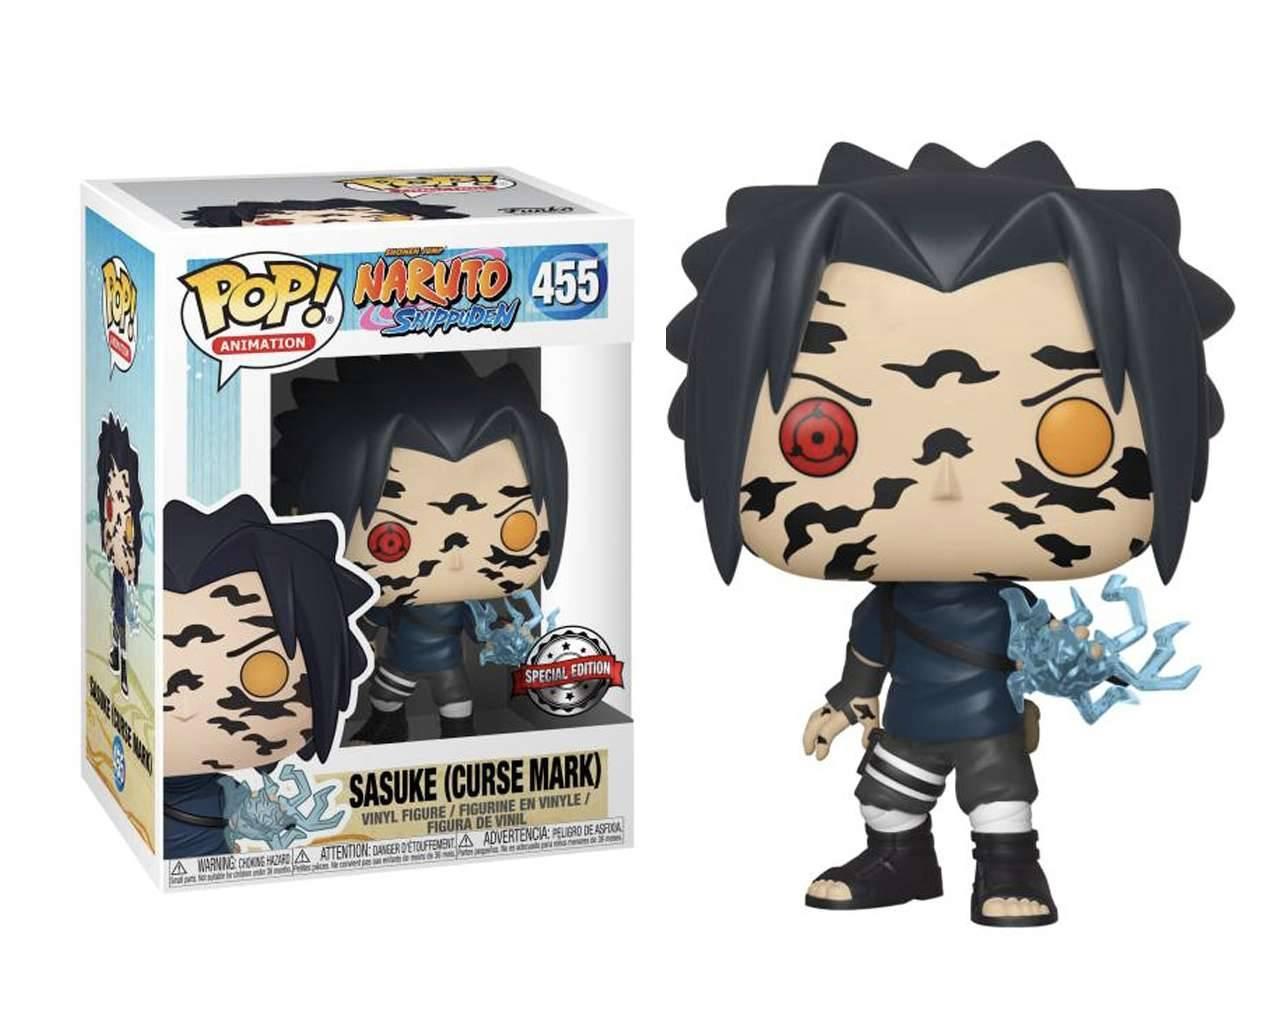 Sasuke (Curse Mark) Pop! Vinyl